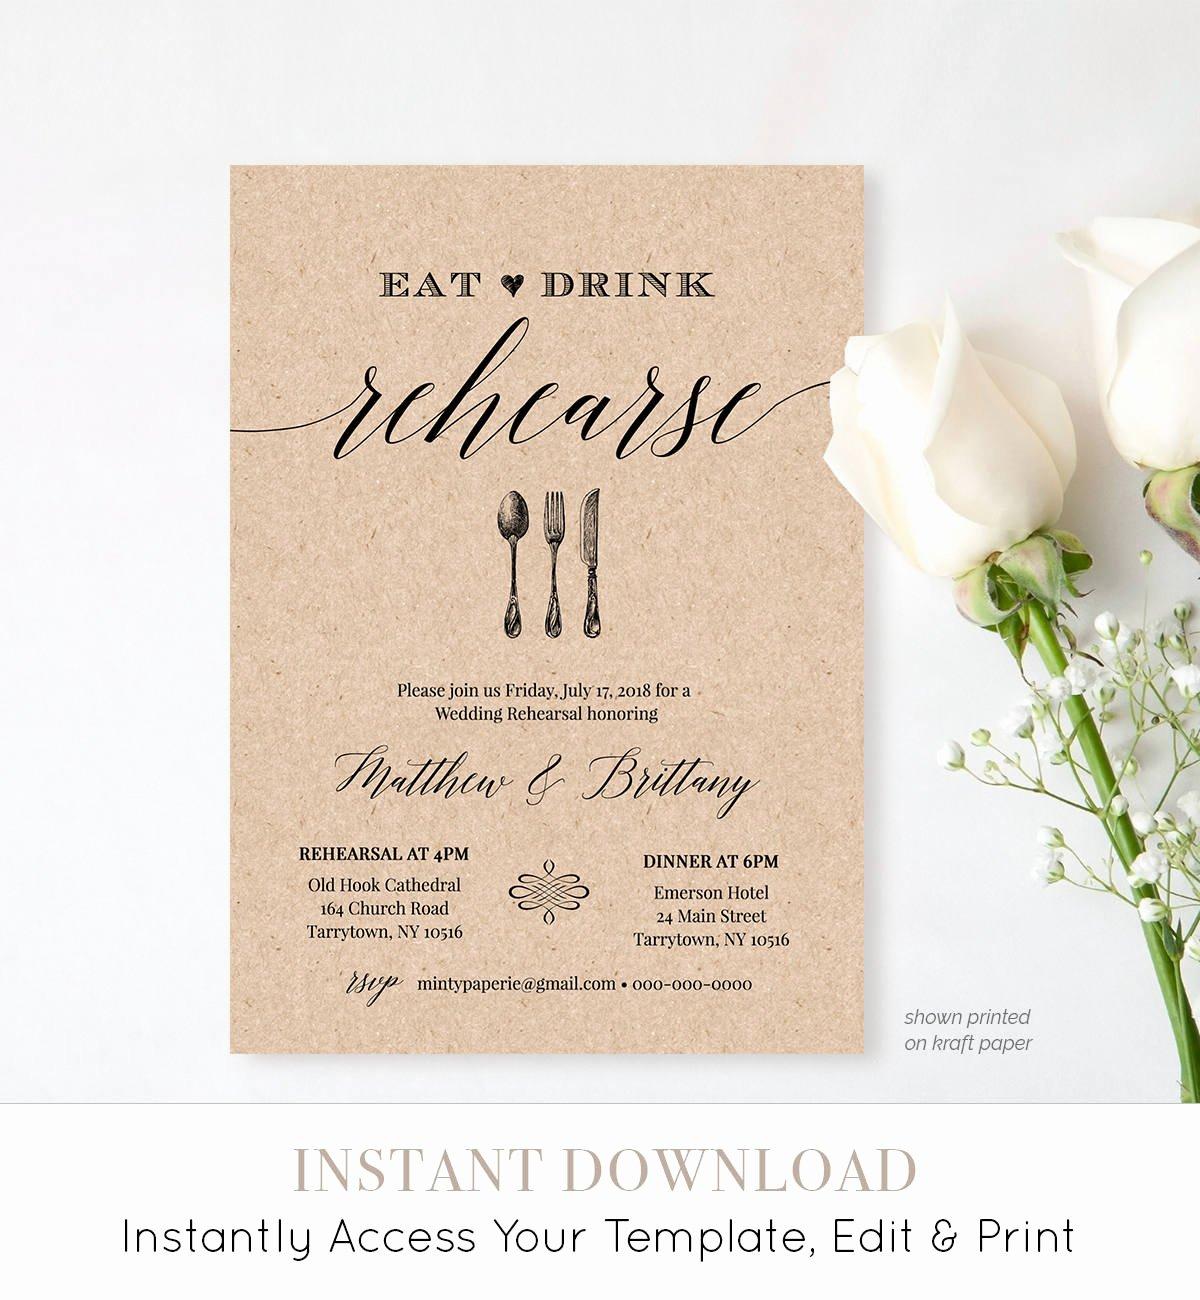 Rehearsal Dinner Invitation Template Unique Rehearsal Dinner Invitation Template Printable Rustic Wedding